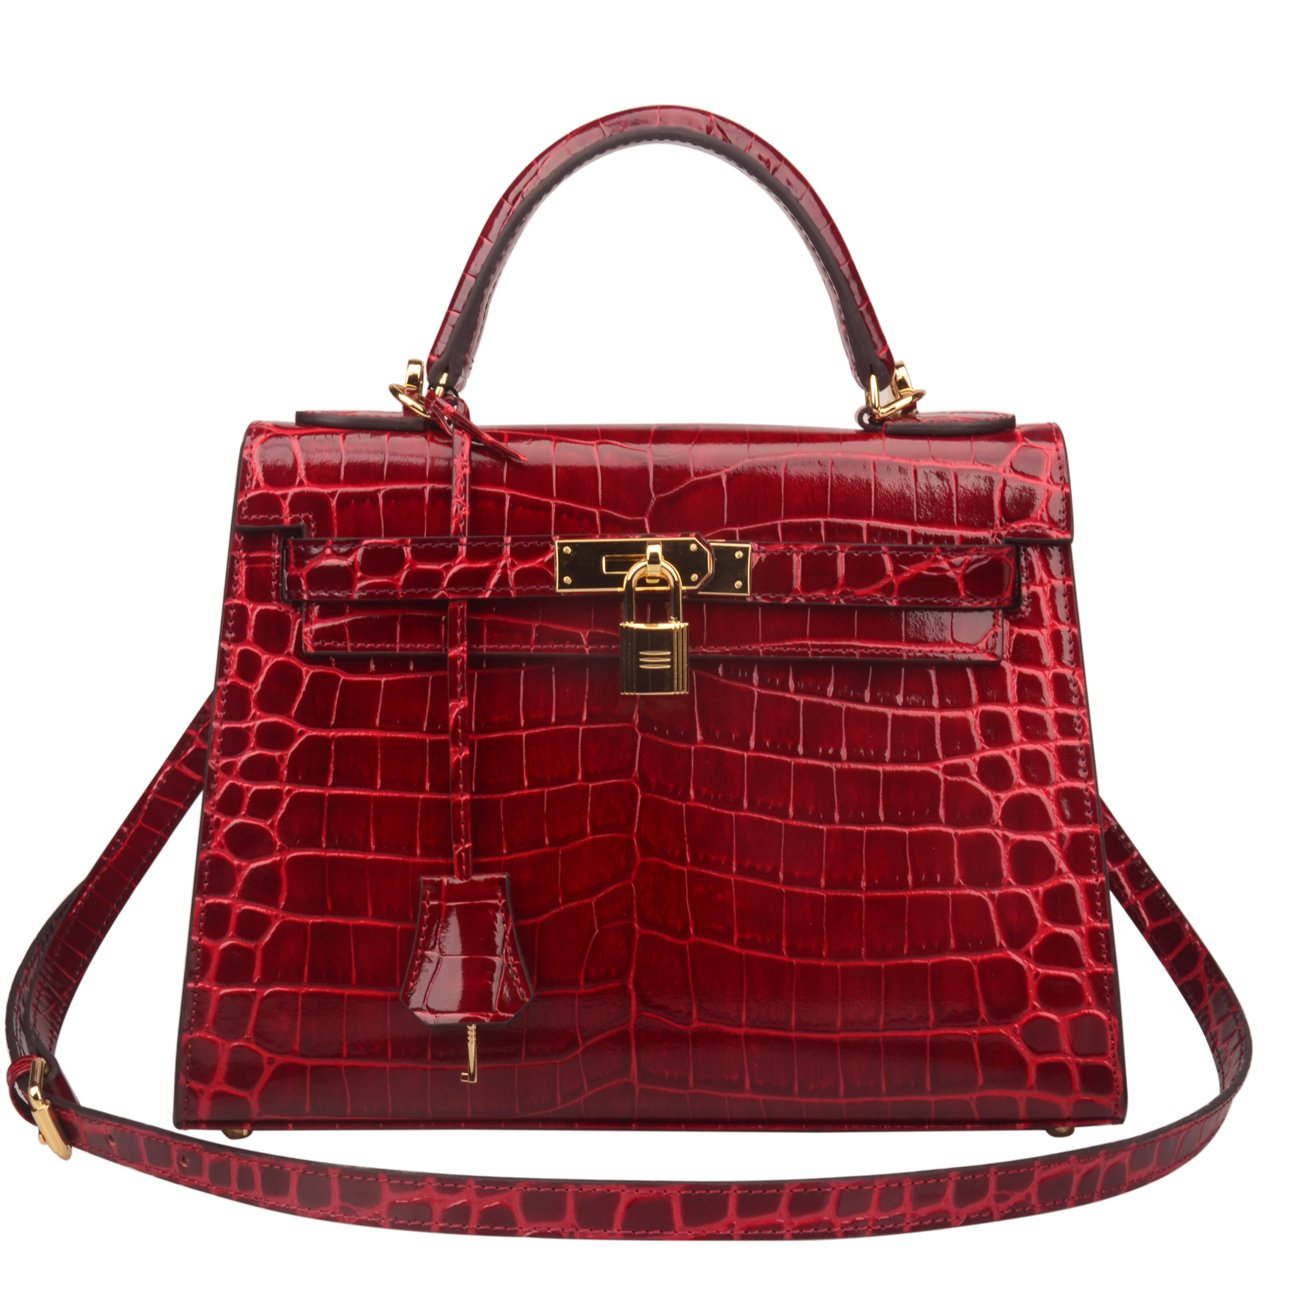 Ainifeel Women's Padlock Crocodile Embossed Patent Leather Shoulder Handbags (28cm, Claret red)